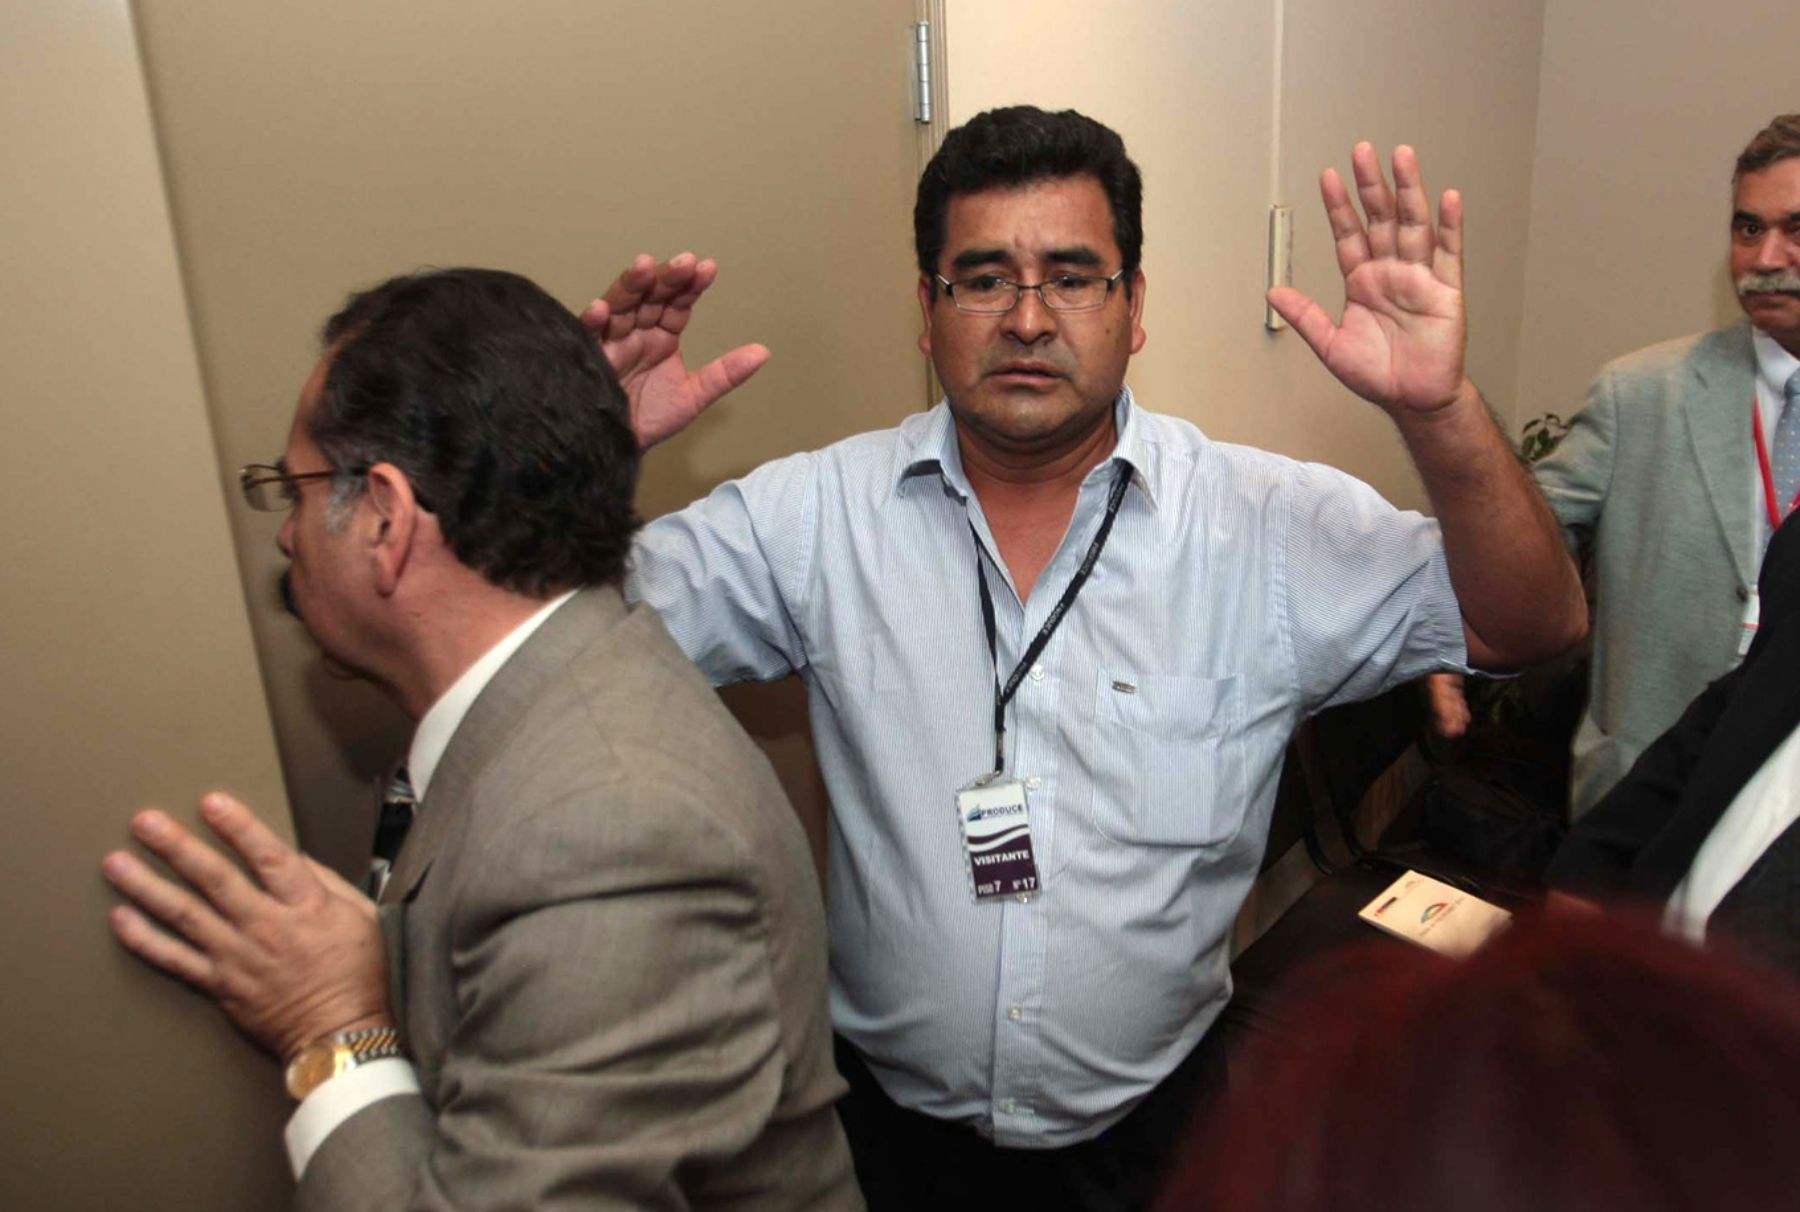 César Álvarez reafirma ser inocente ante la Sala Penal por el caso Nolasco